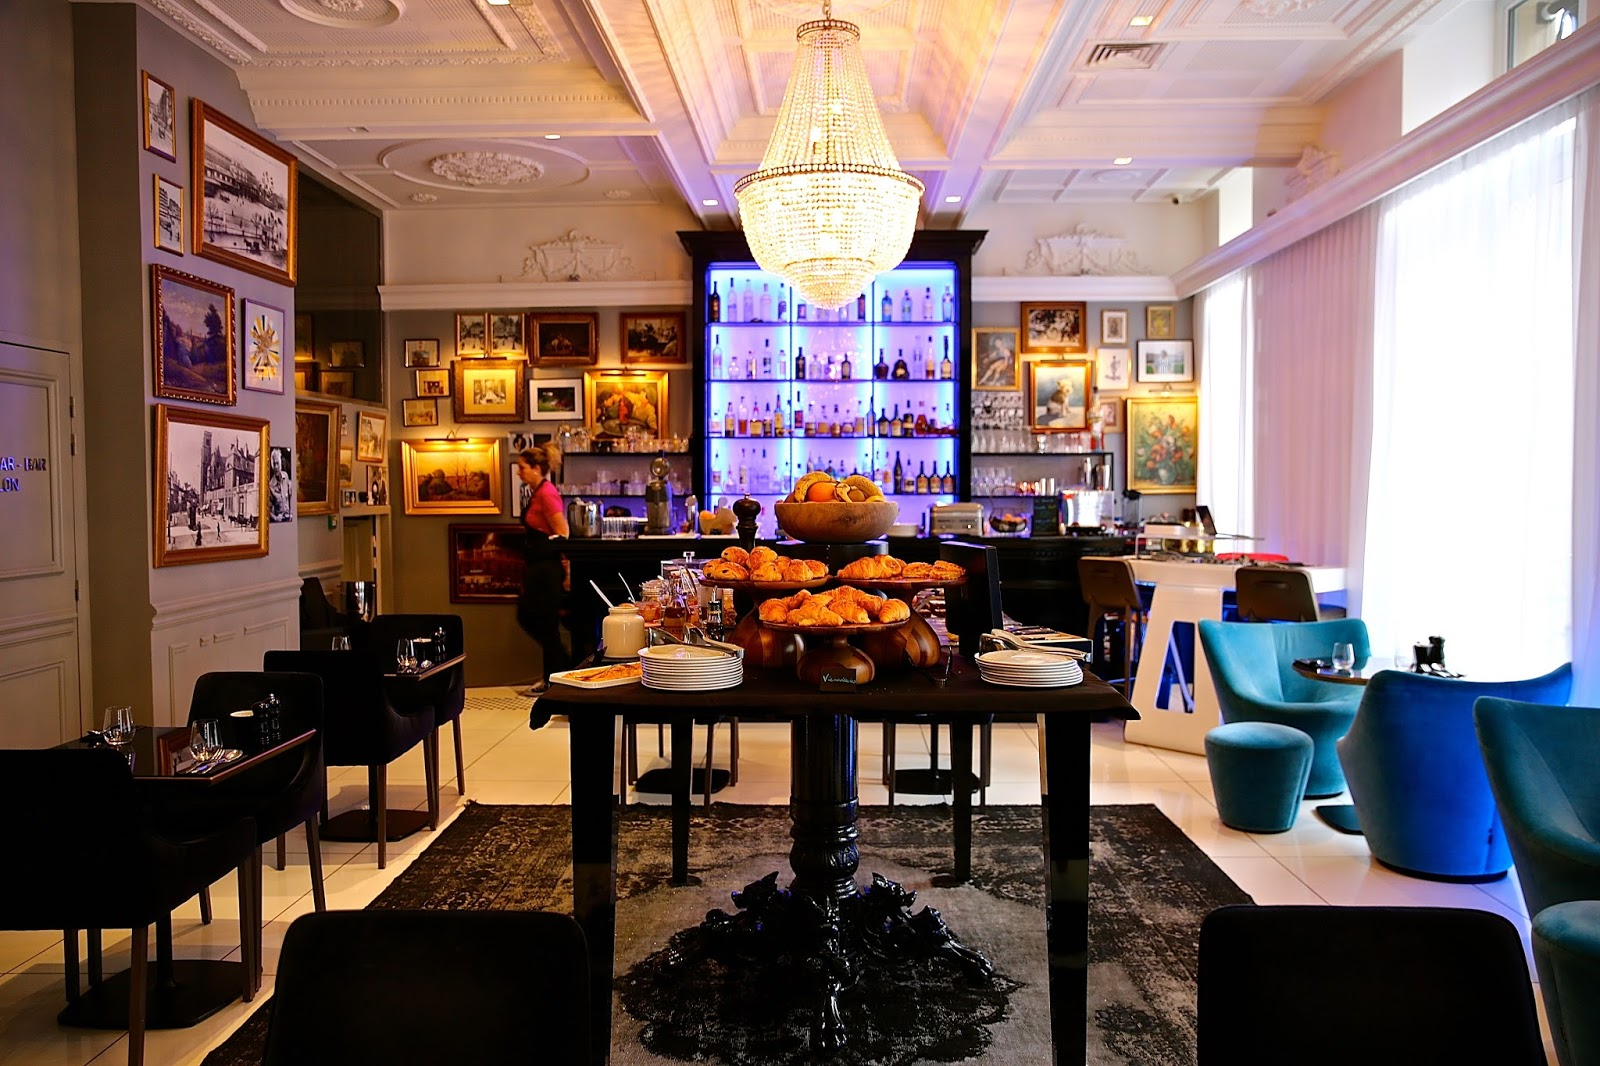 Hotel Spa Bourgogne Promo